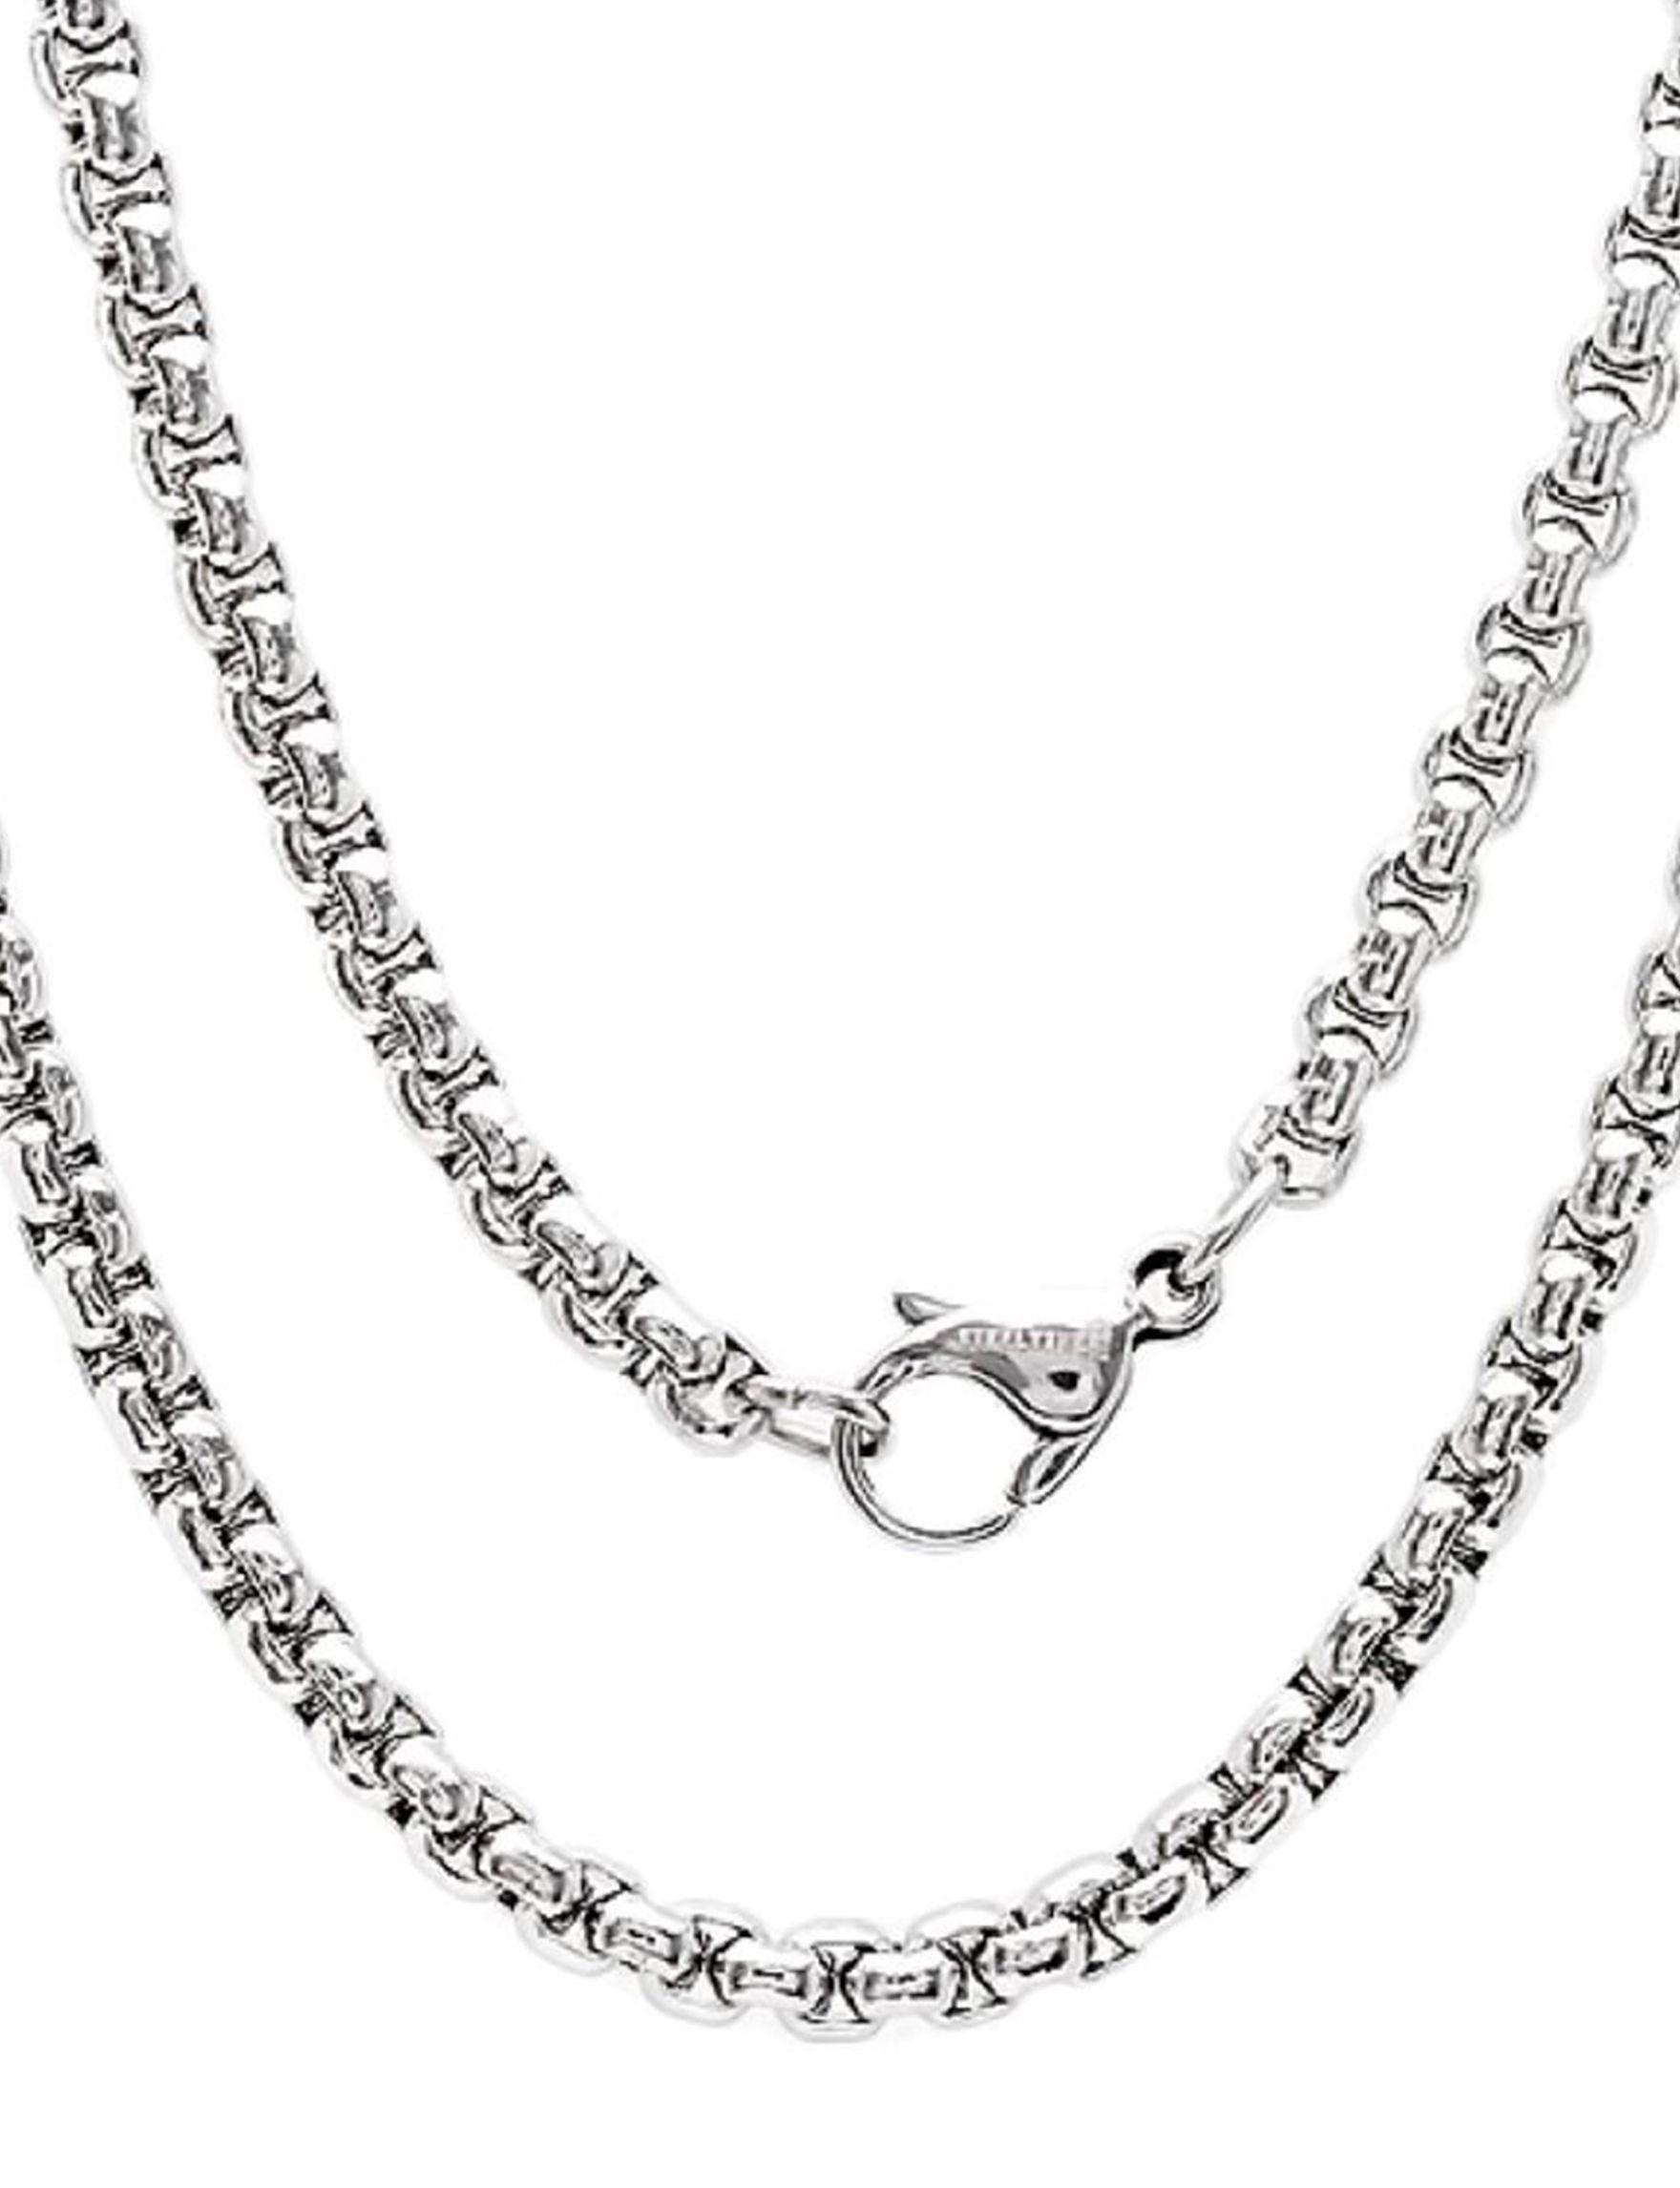 Steeltime Steel Necklaces & Pendants